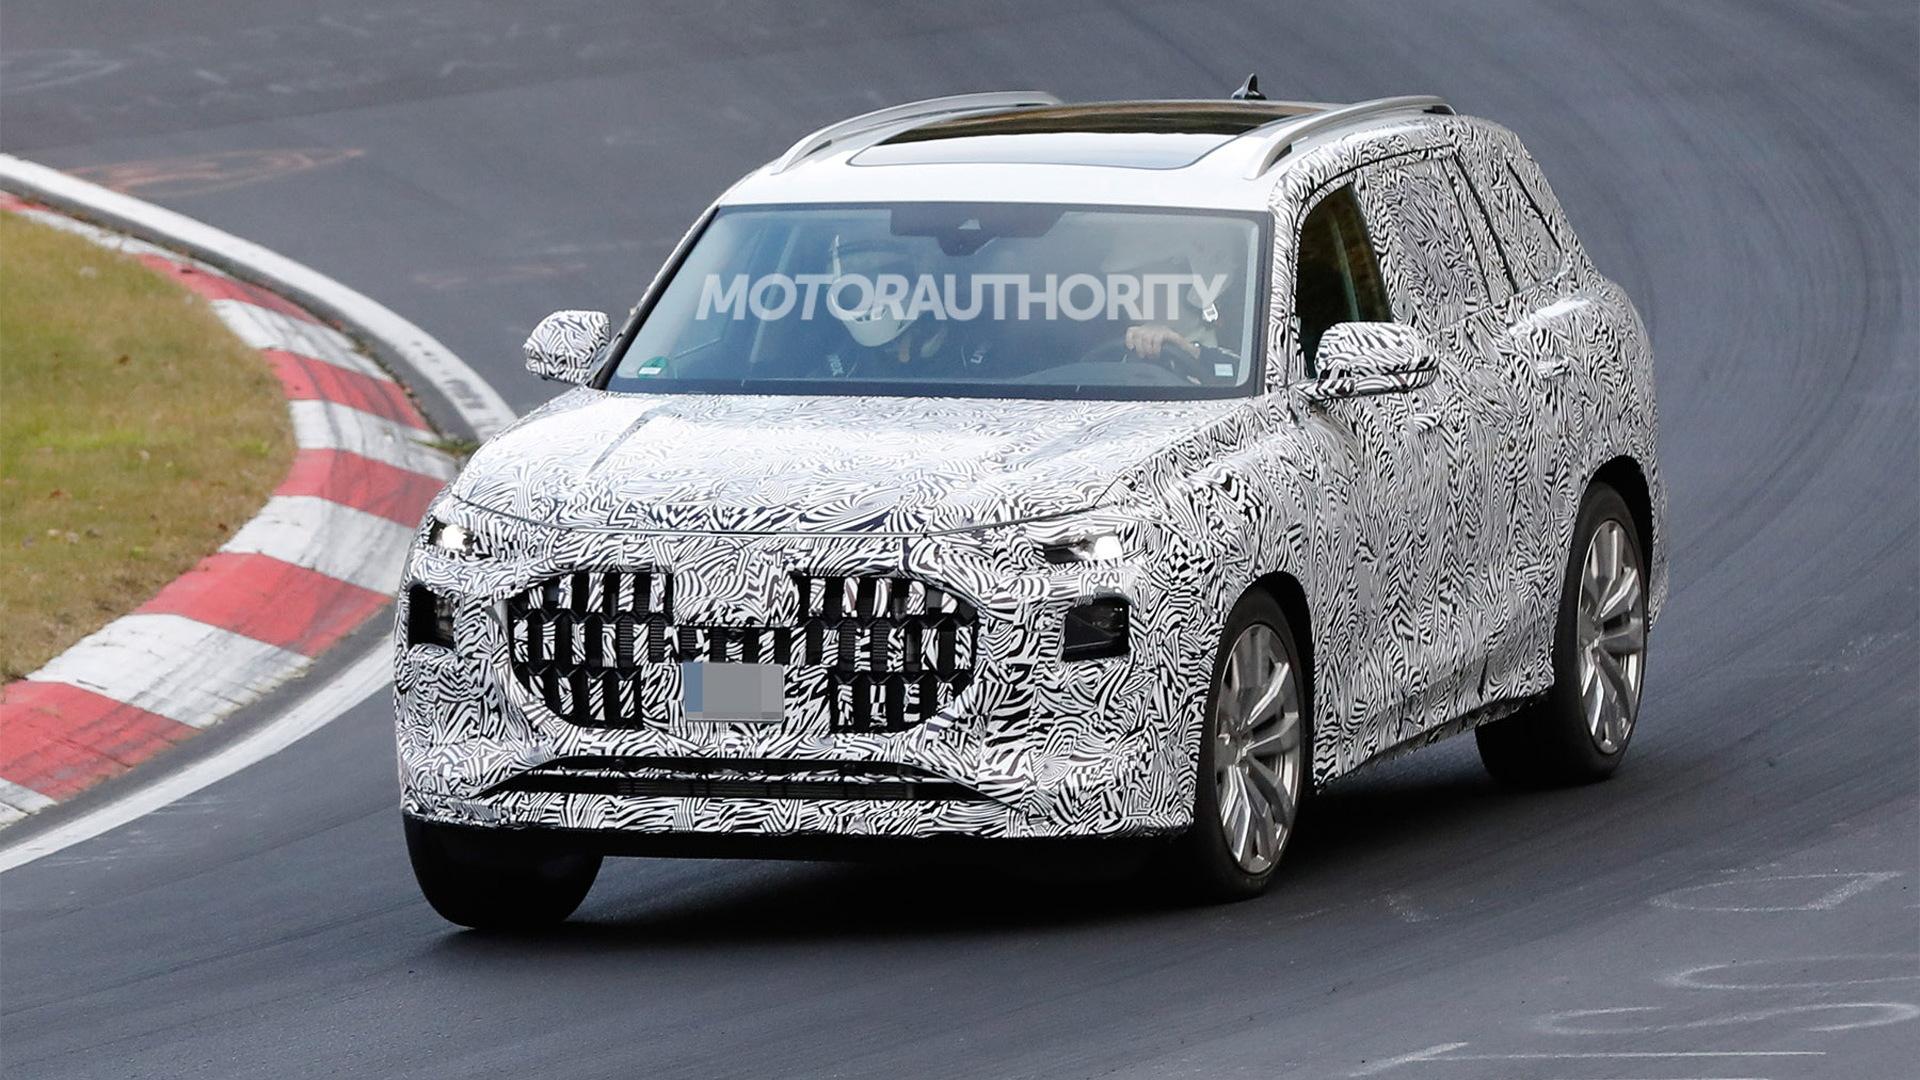 2023 Audi Q9 spy shots - Photo credit:S. Baldauf/SB-Medien